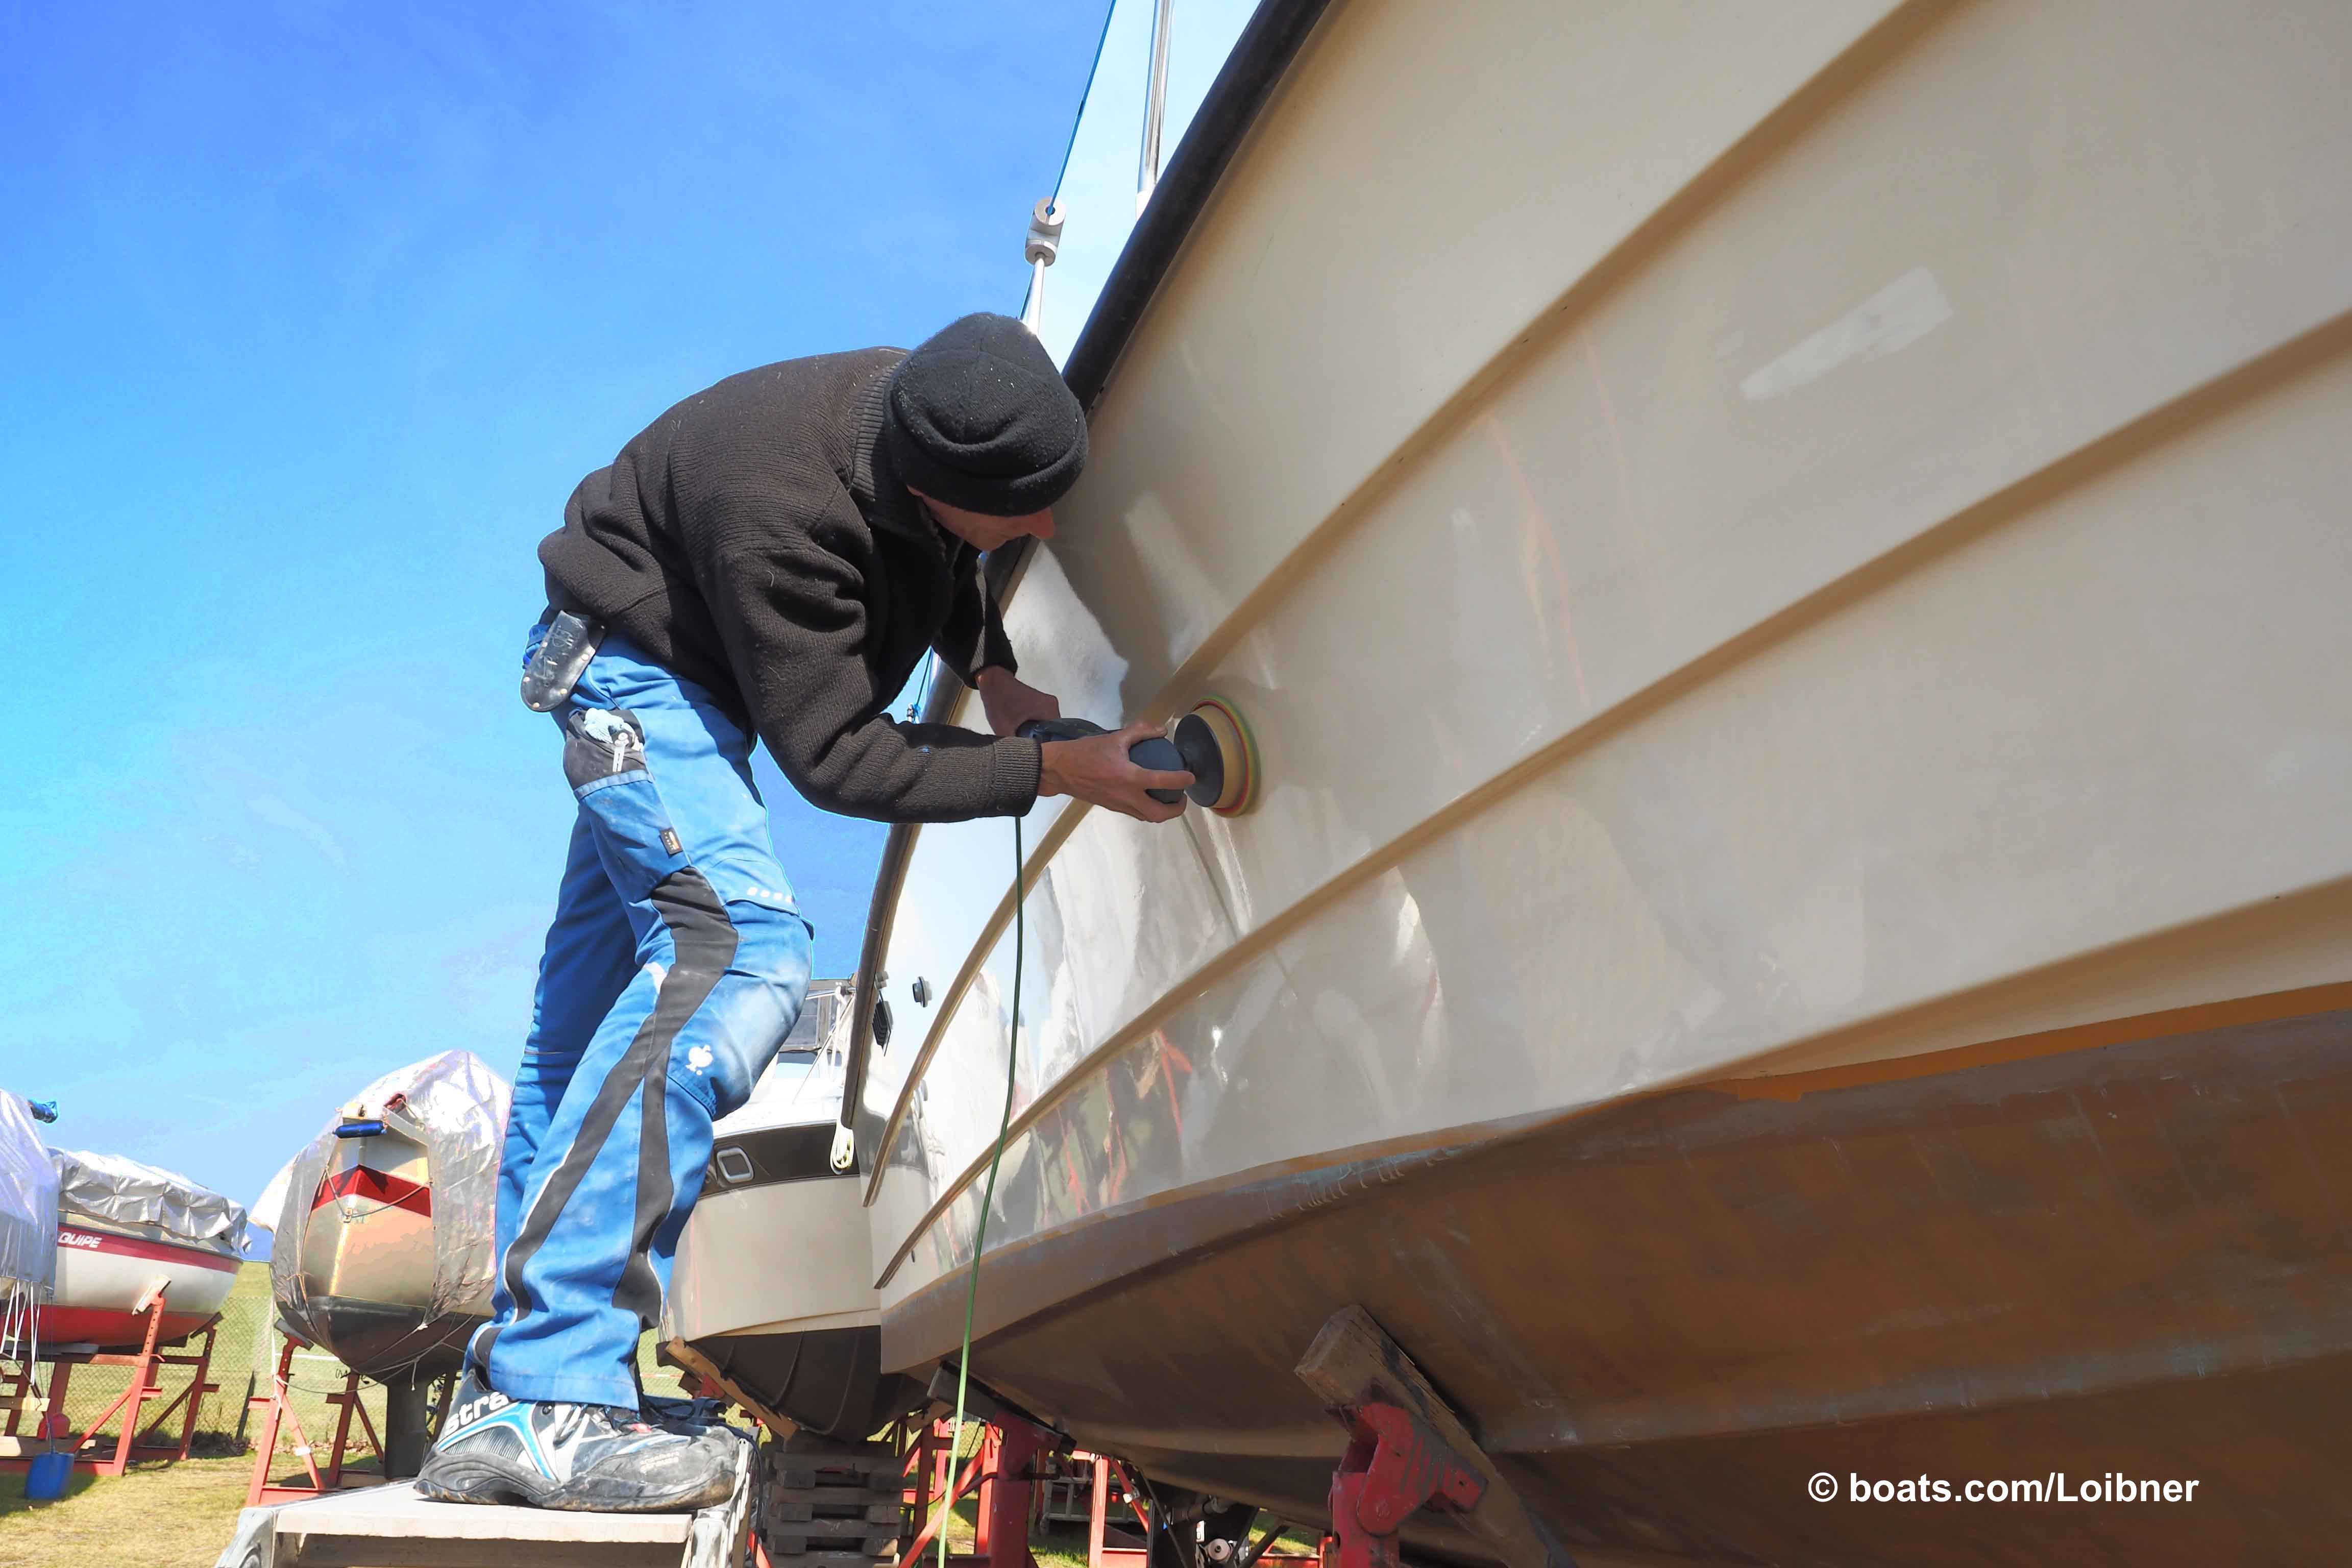 Gut gemocht Perfekt polieren: Hochglanz-Kur für Ihr Boot - boats.com KH87